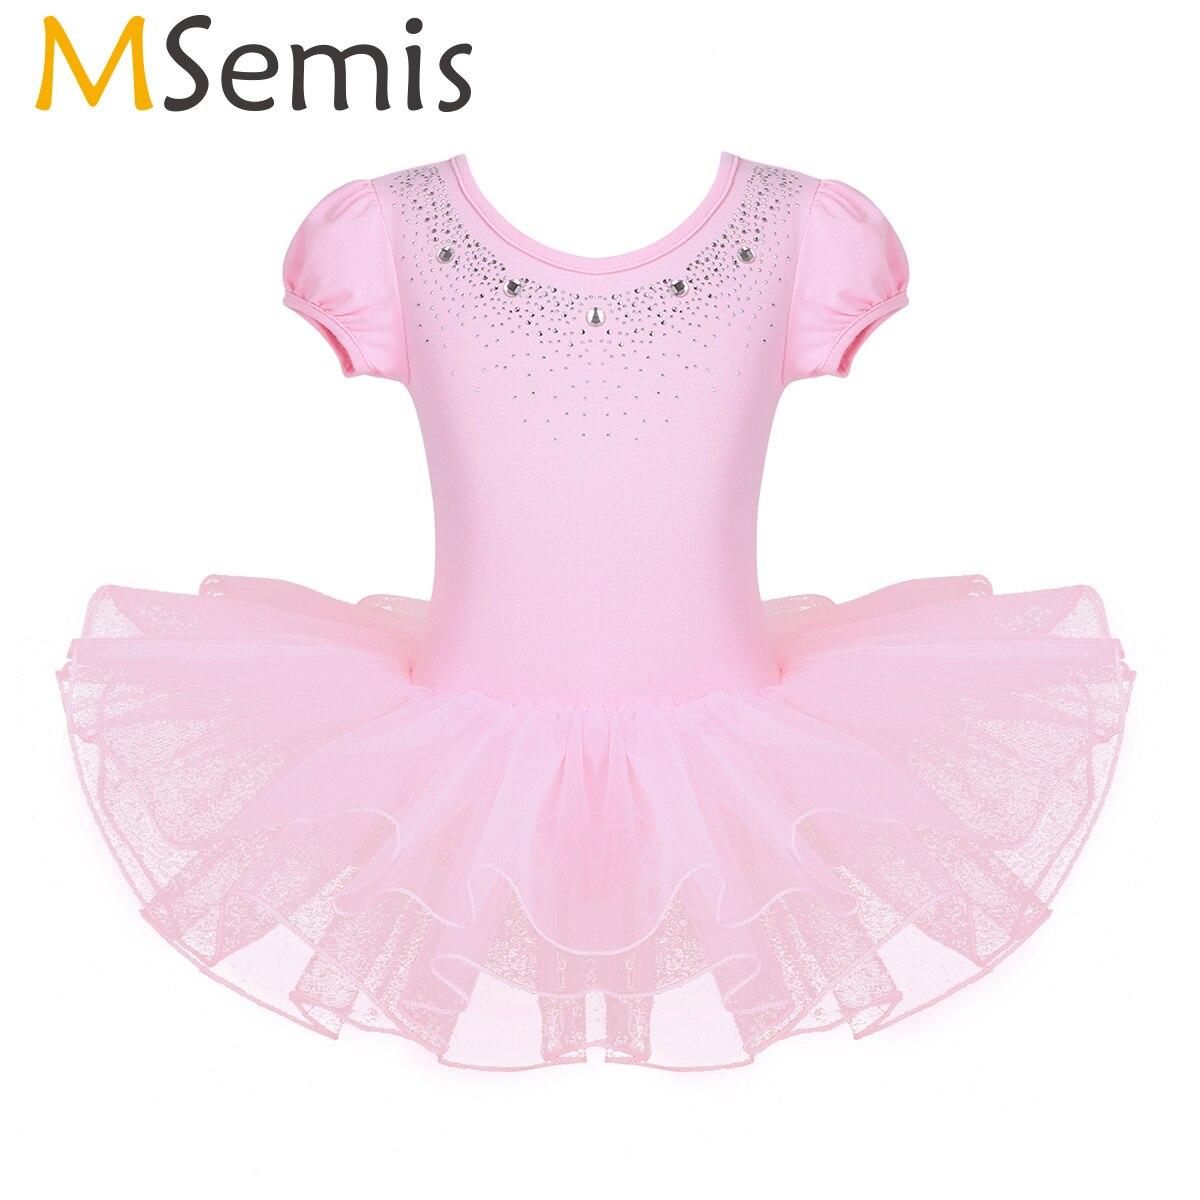 MSemis Baby Girl Rhinestones Bubble Sleeve Tutu Ballet Dress Kid Gymnastics Leotard Fairy Princess Dress Ballerina Dance Costume